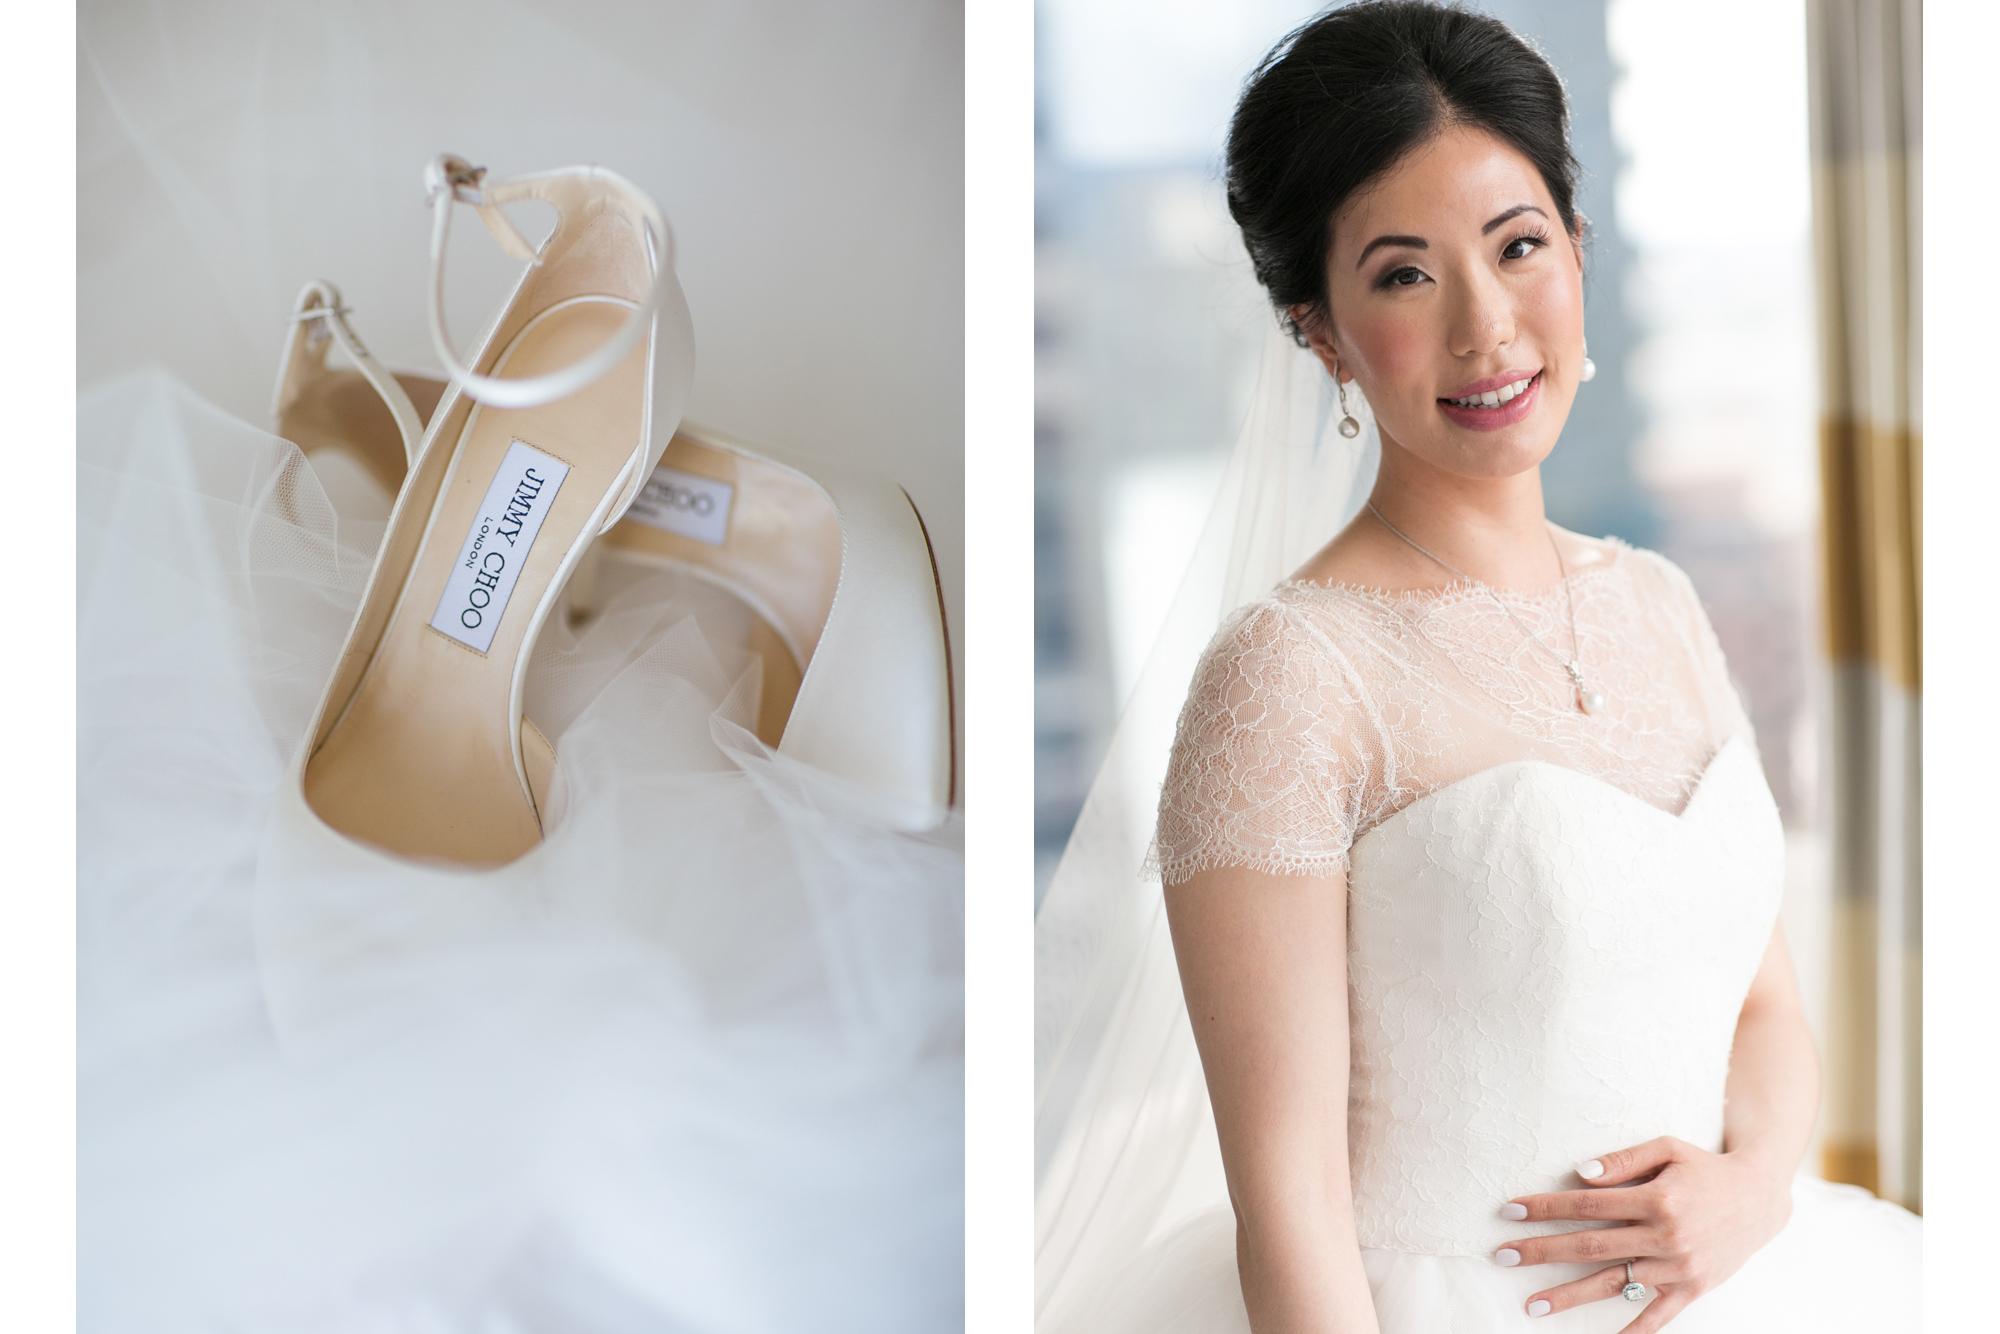 vancouver-luxury-wedding-photographer-lori-miles-3.jpg